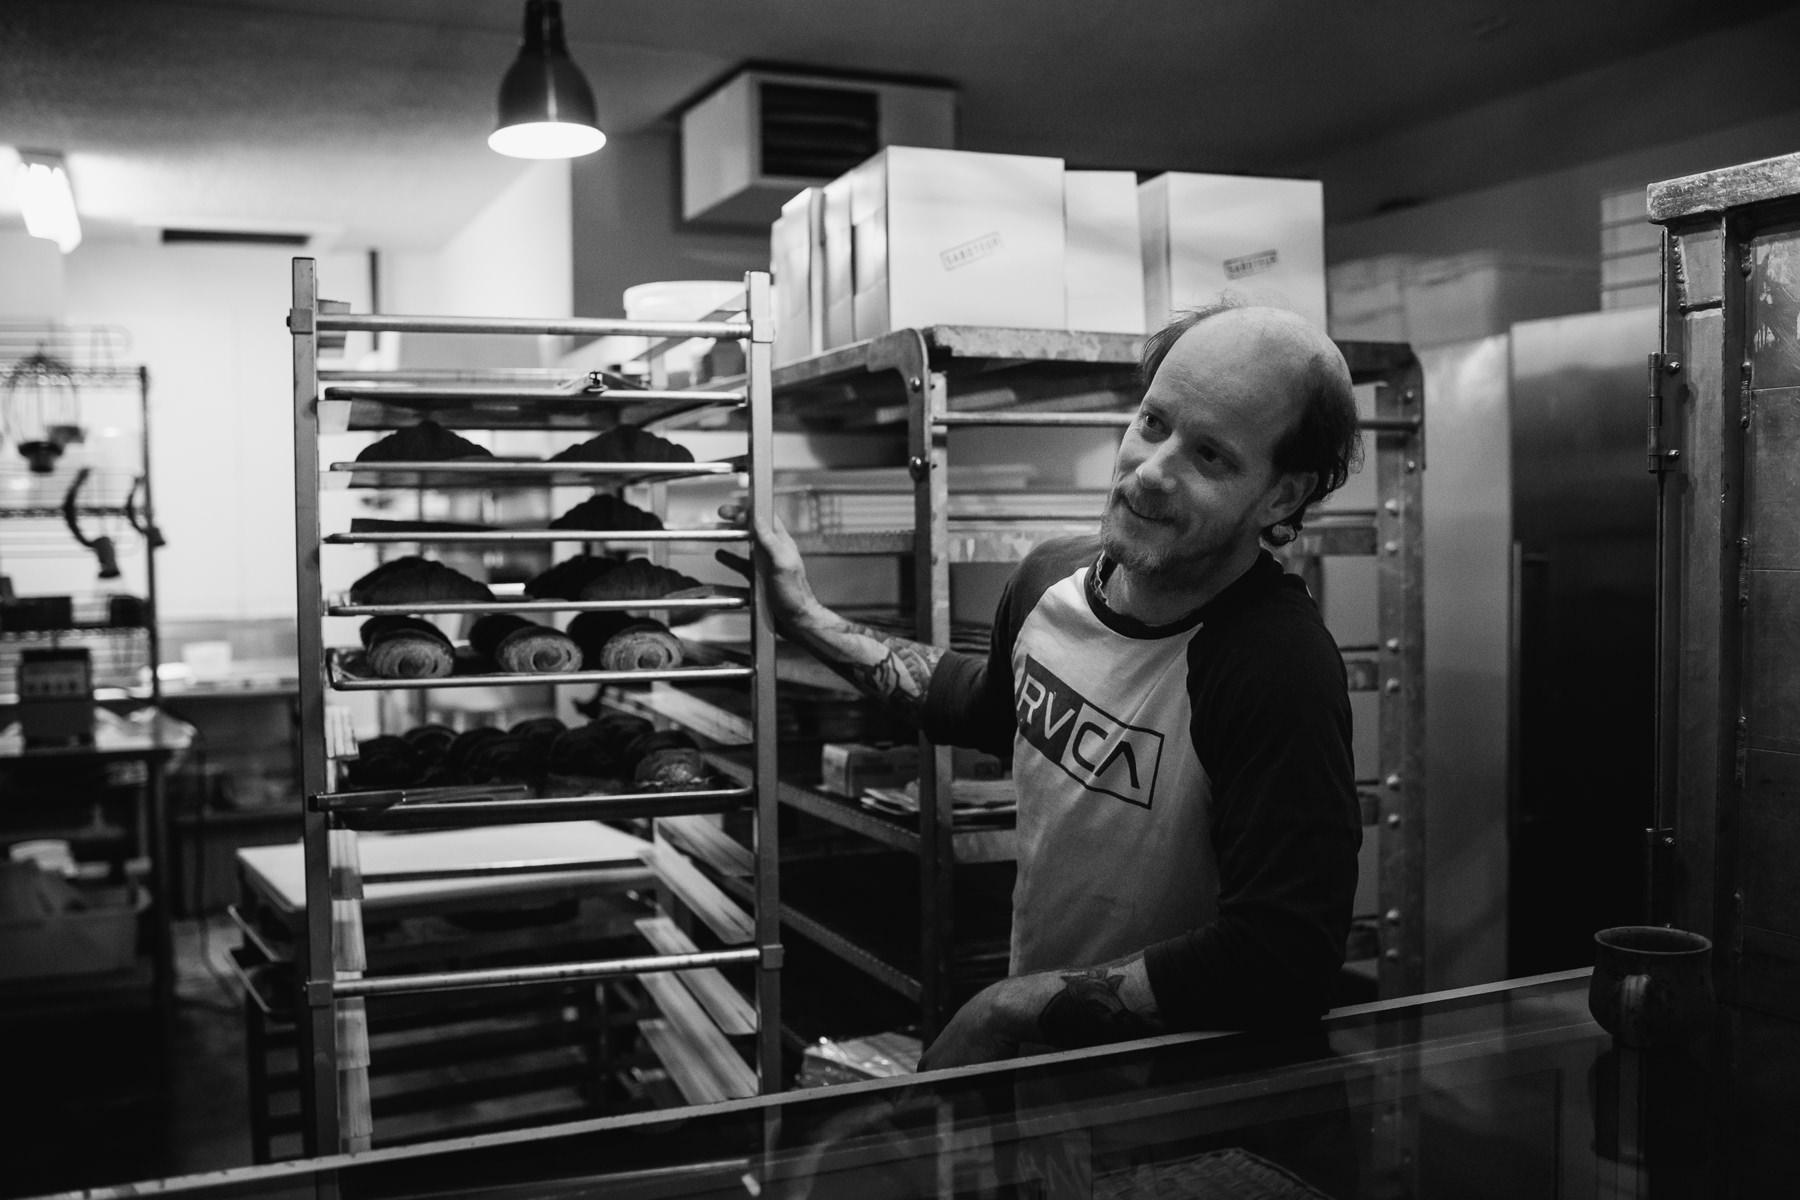 matt-tinder-saboteur-bakery-bremerton-wa-43